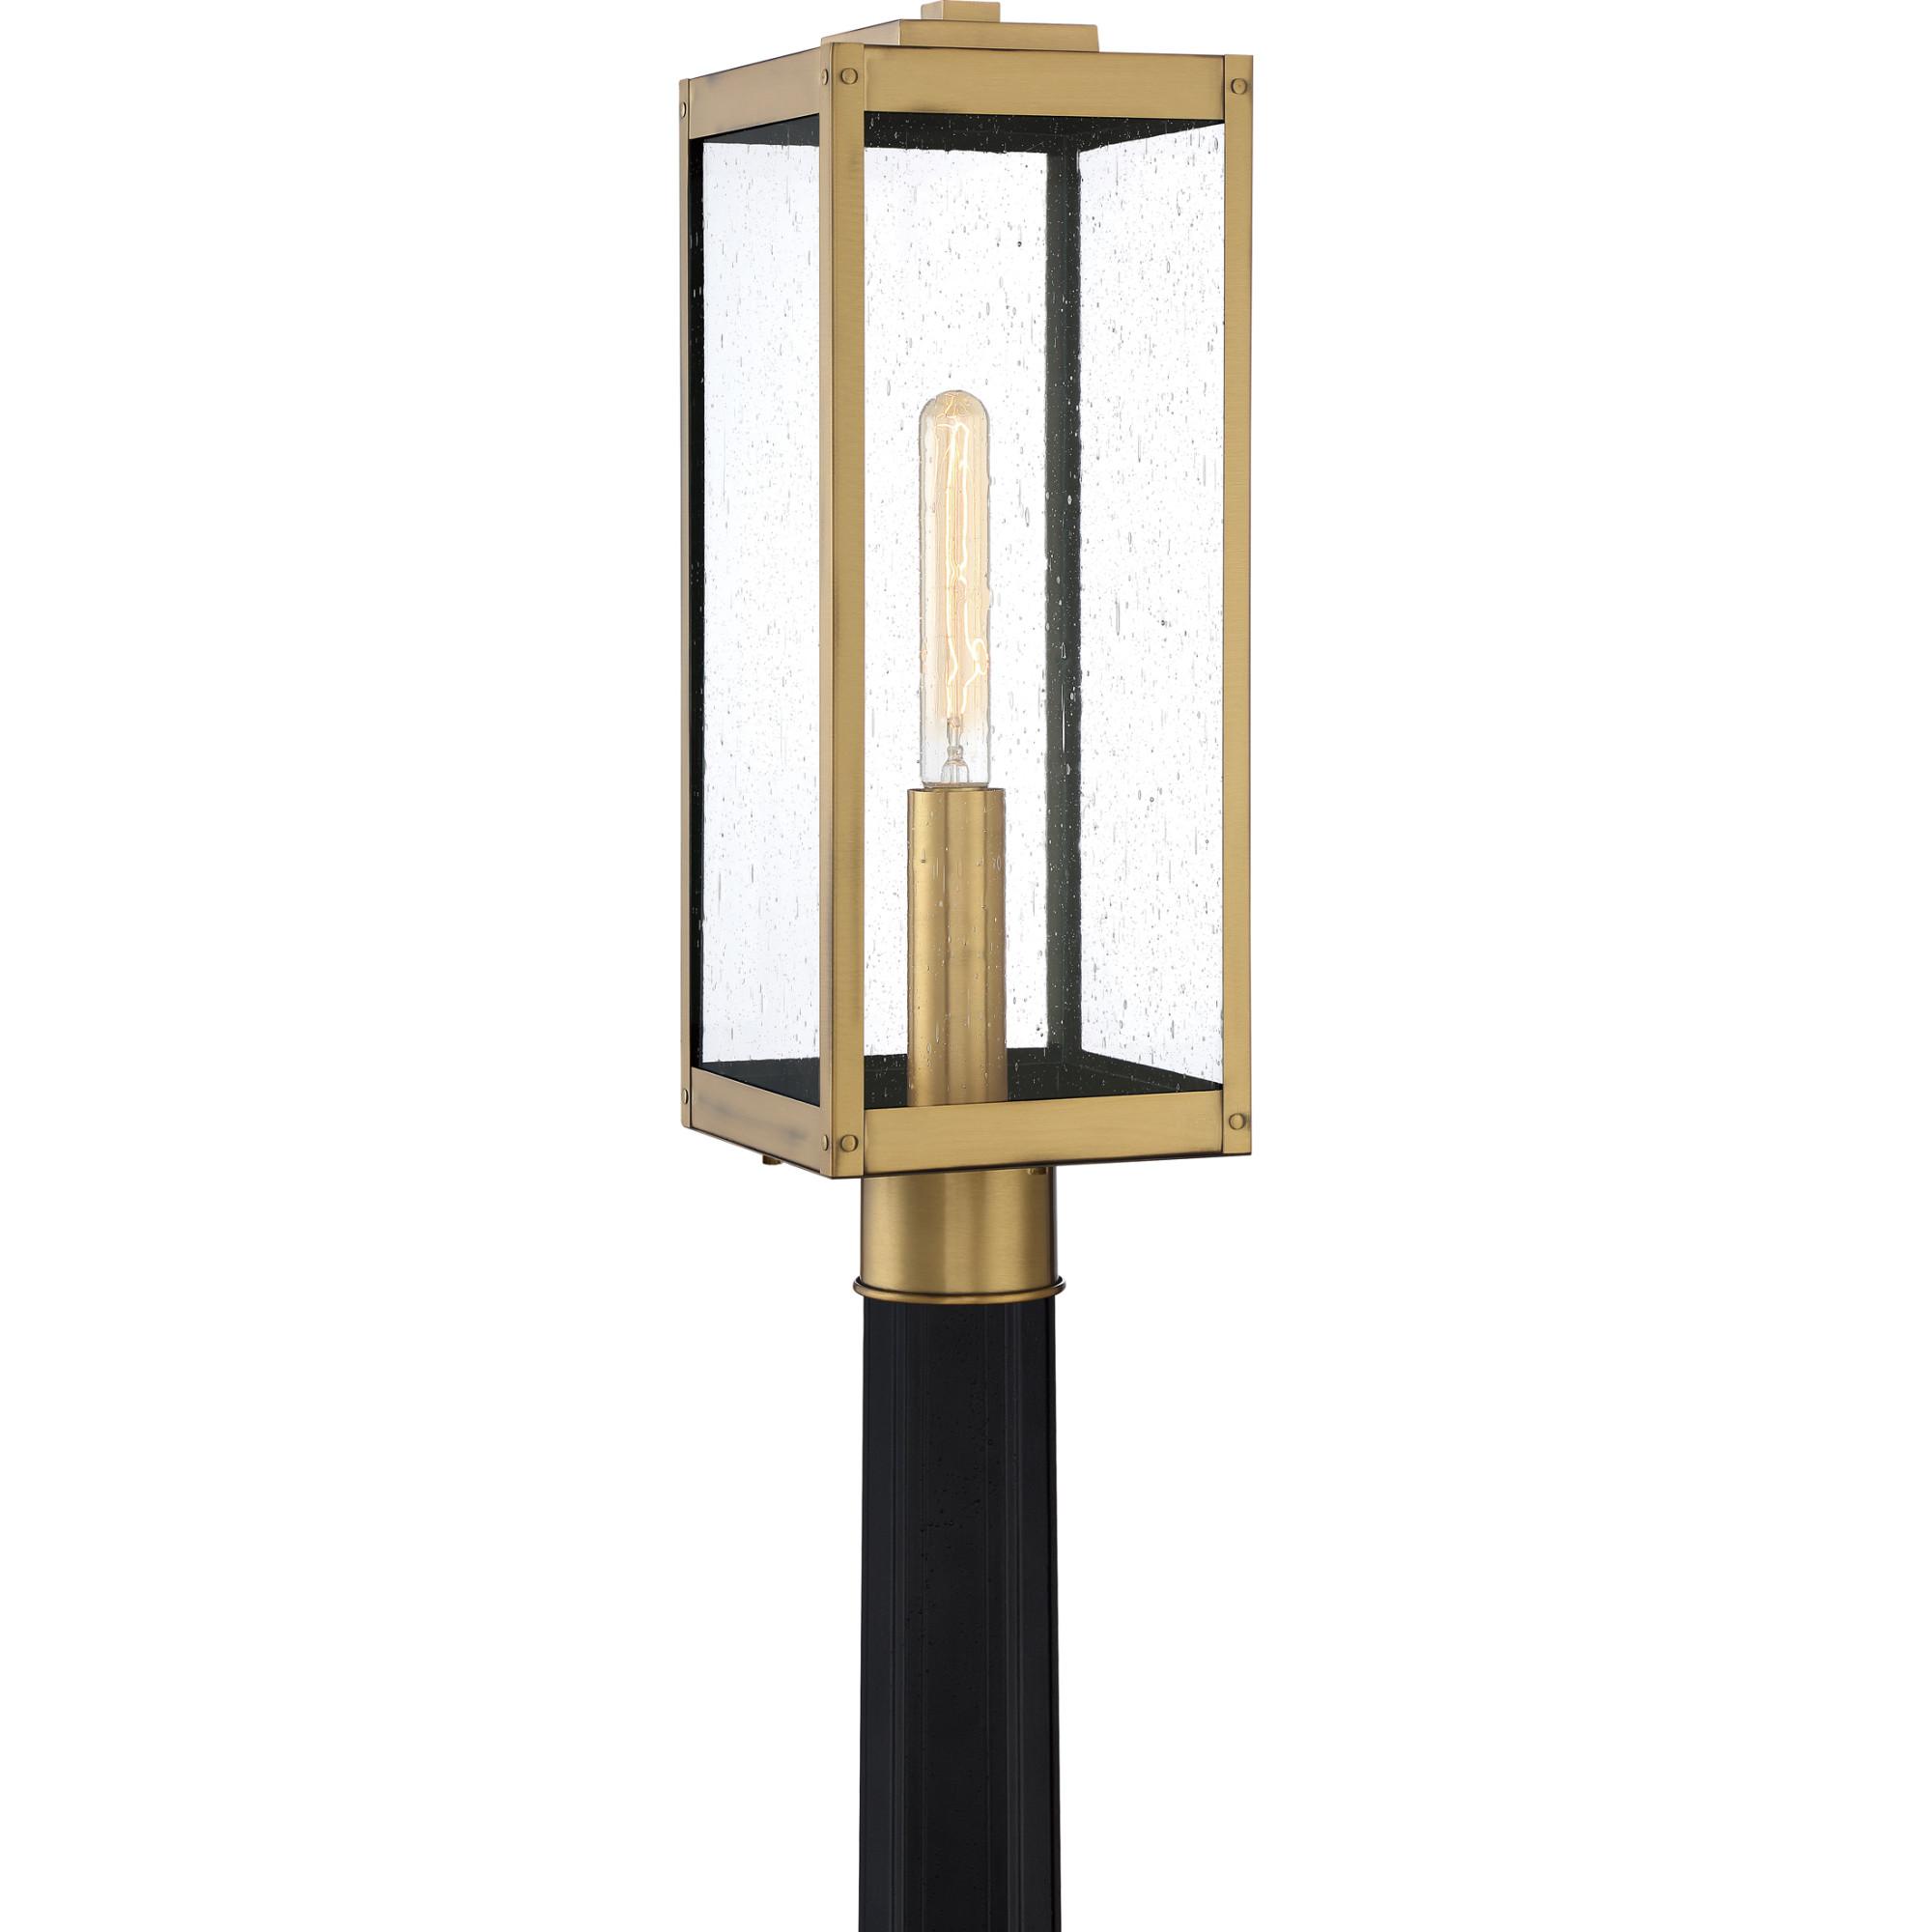 "Quoizel WVR9007 Westover Single Light 21"" Tall Outdoor Single Head Post Light"